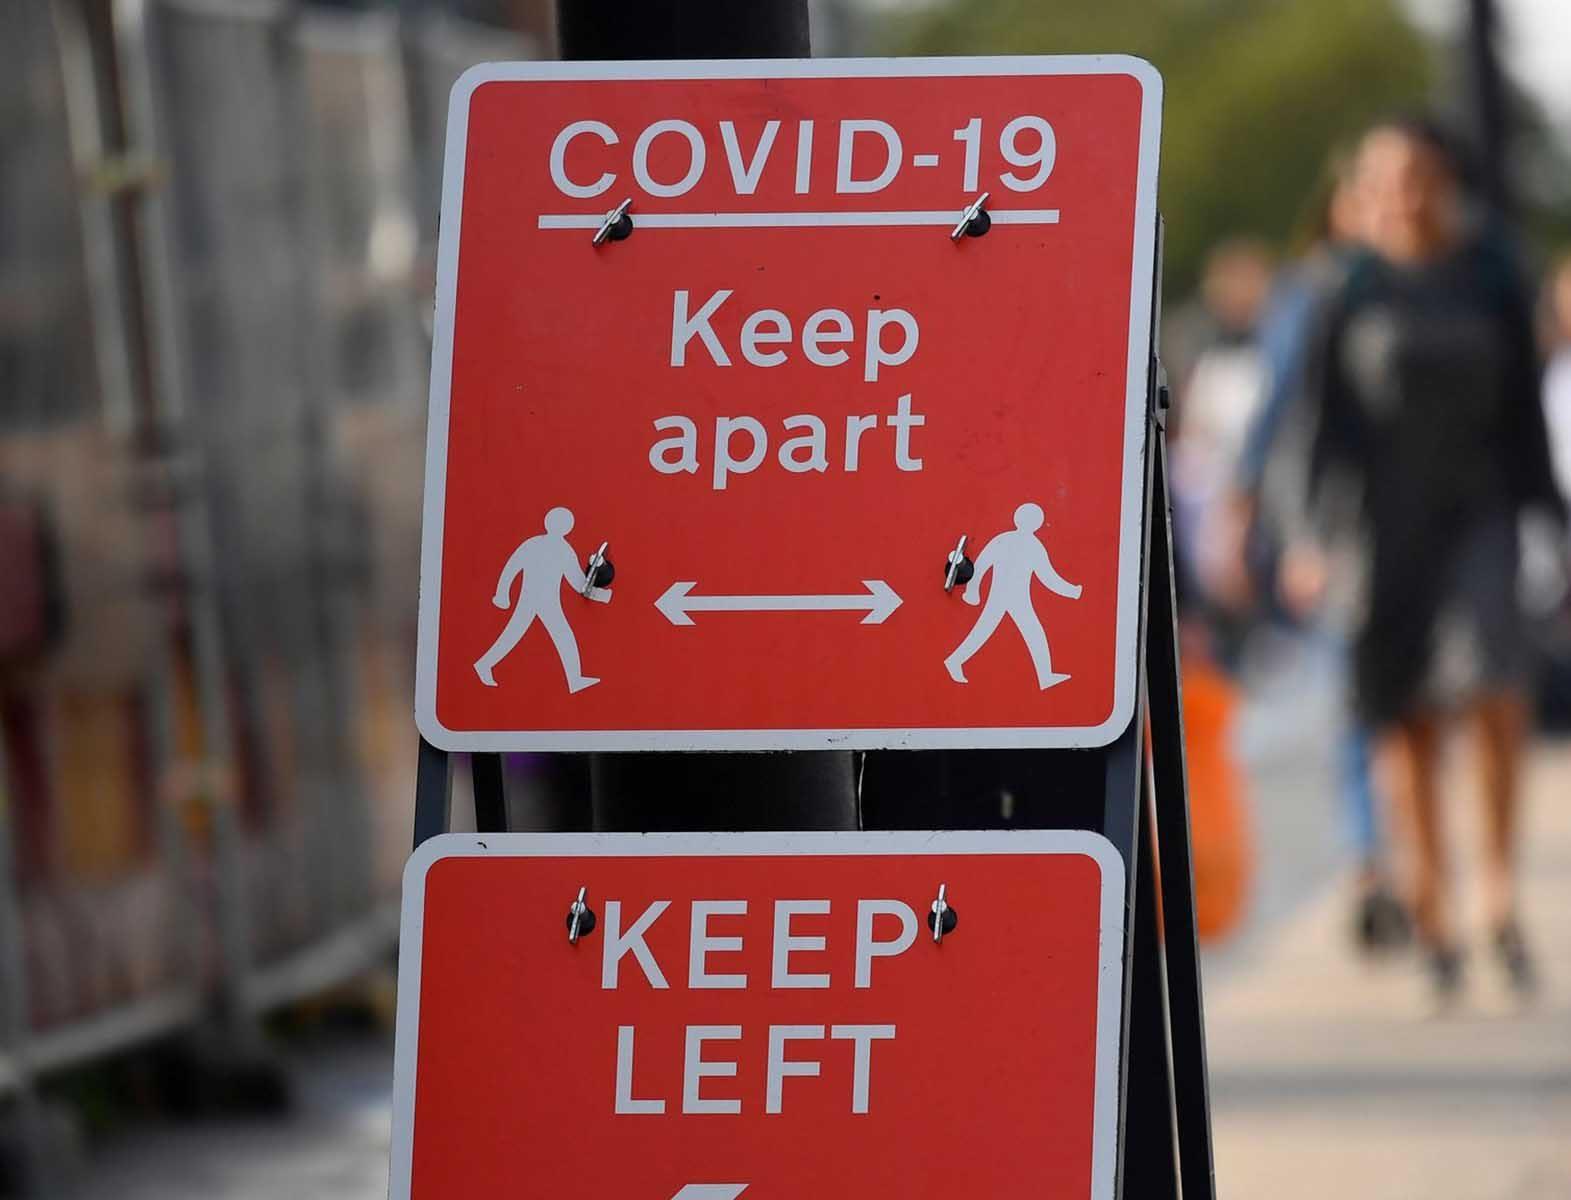 covid-19 keep apart temporary street sign